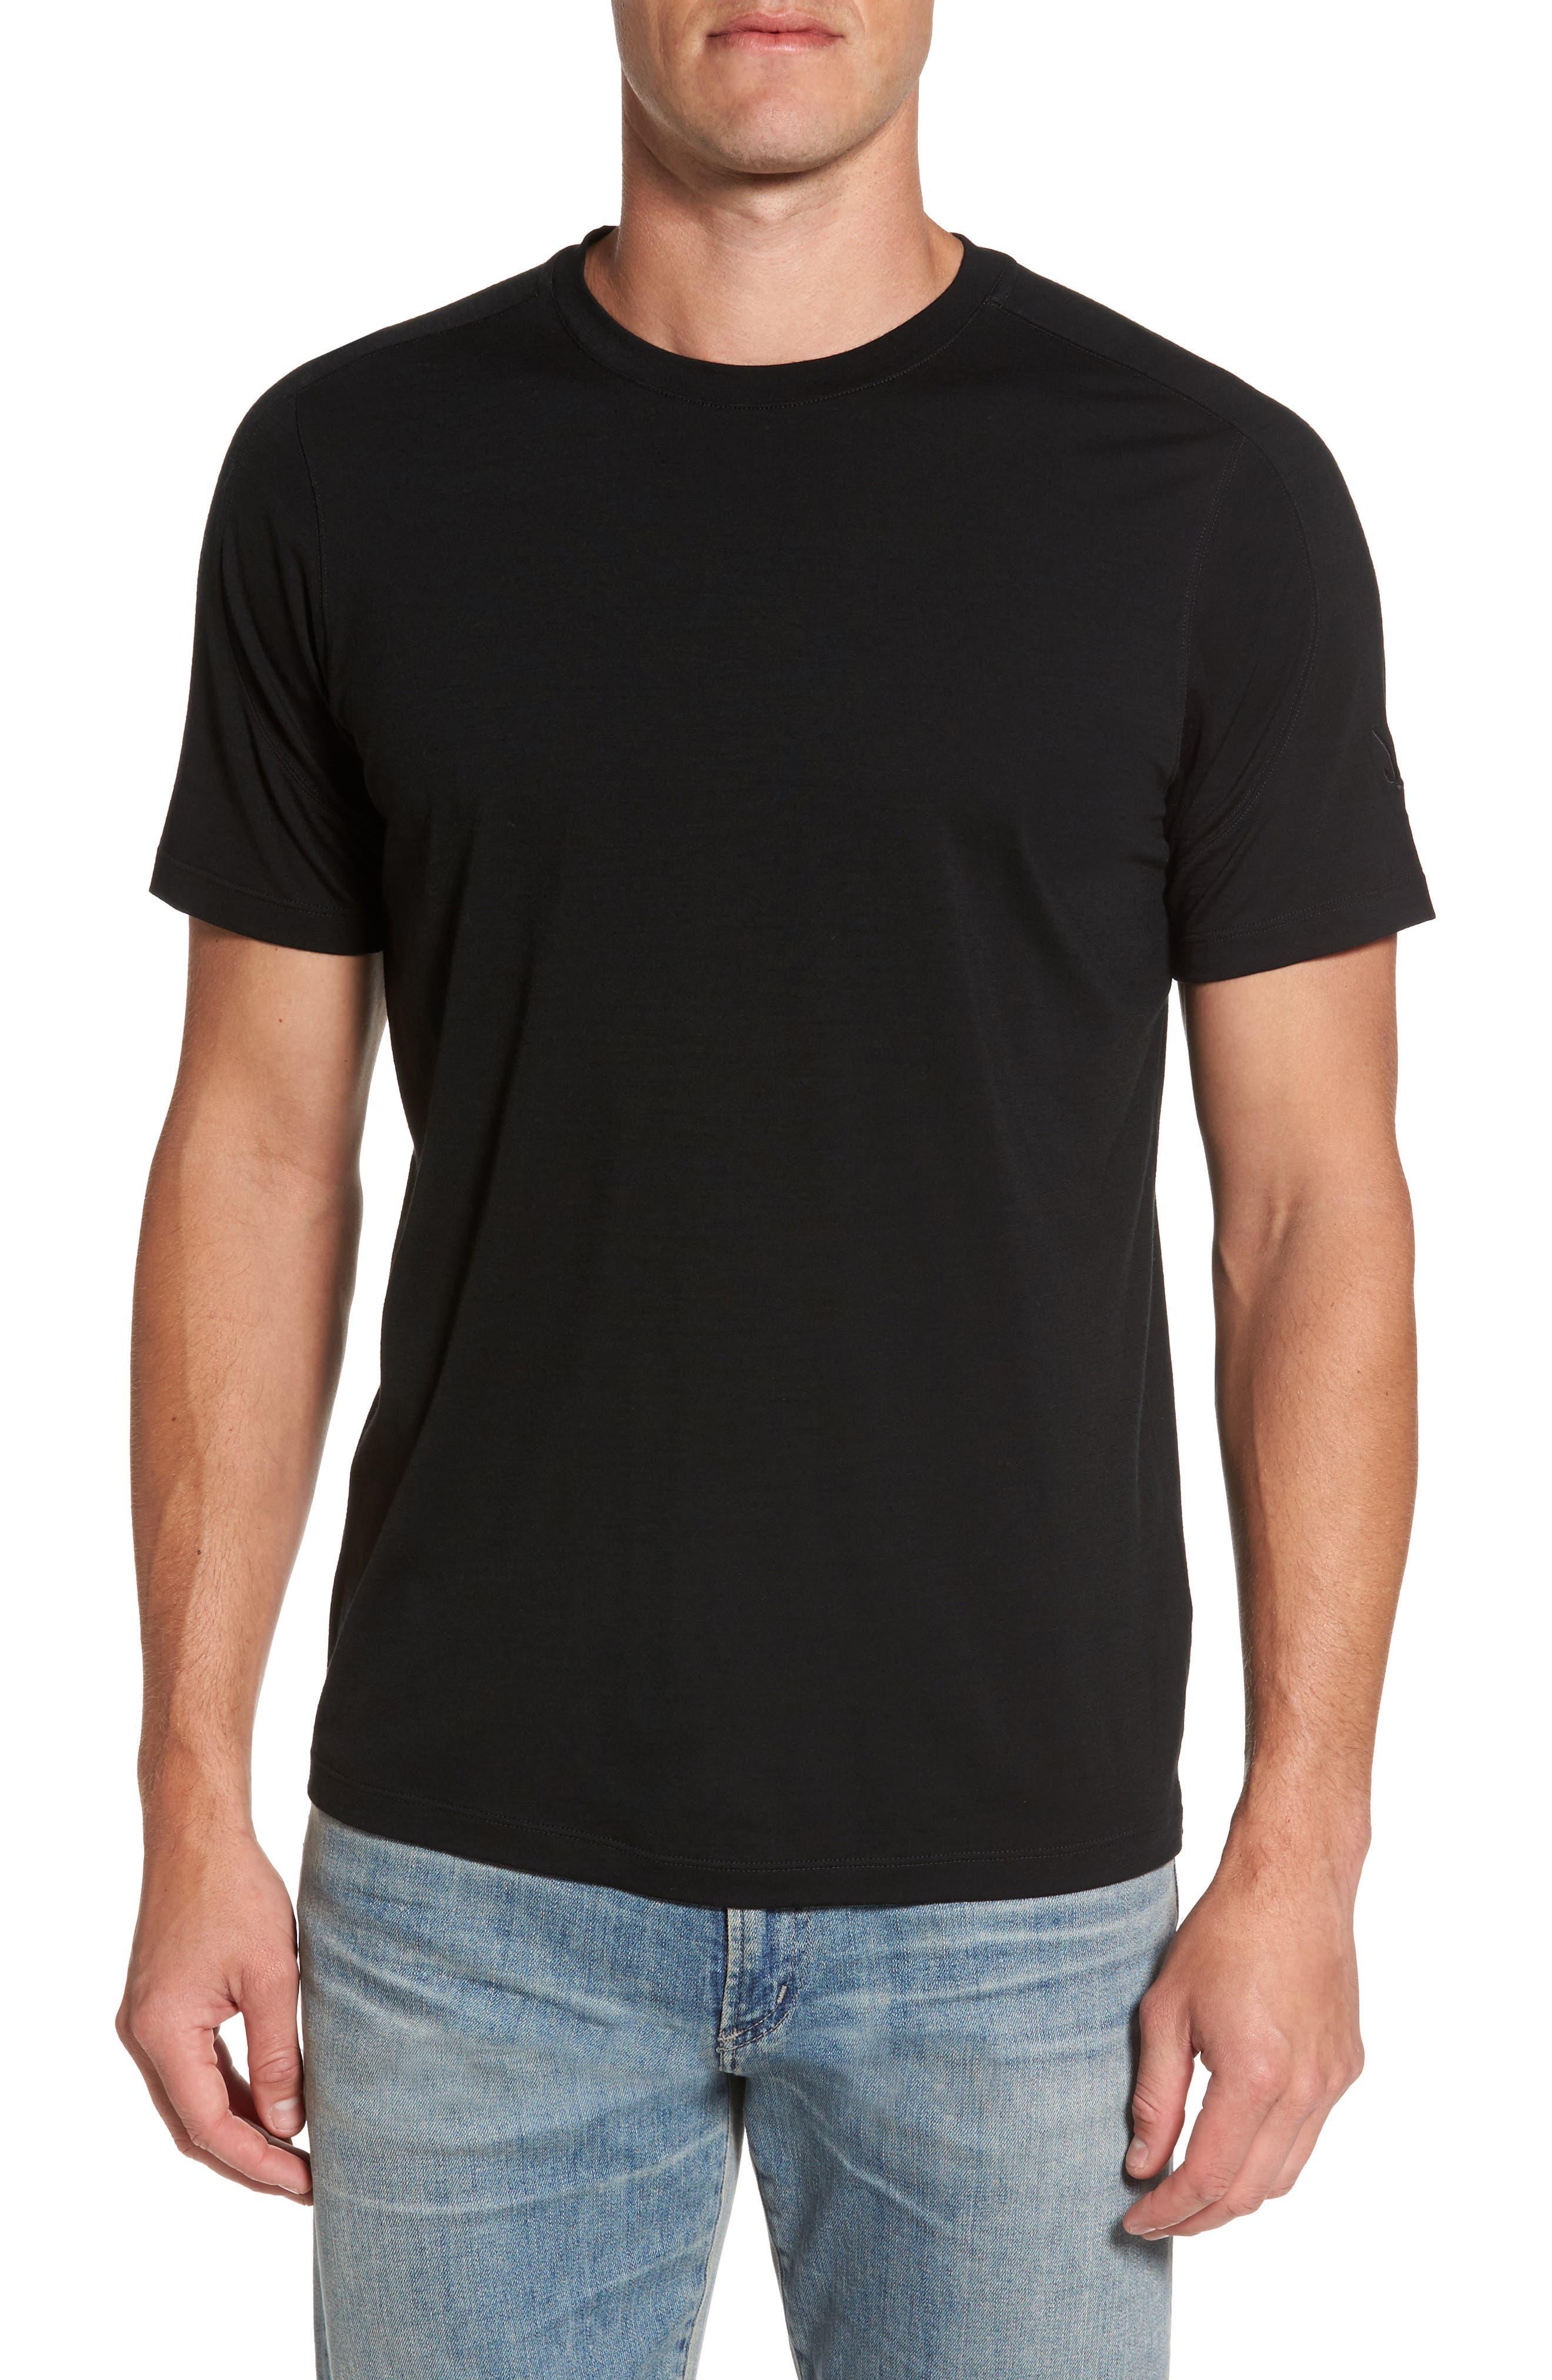 Odyssey T-Shirt,                             Main thumbnail 1, color,                             001